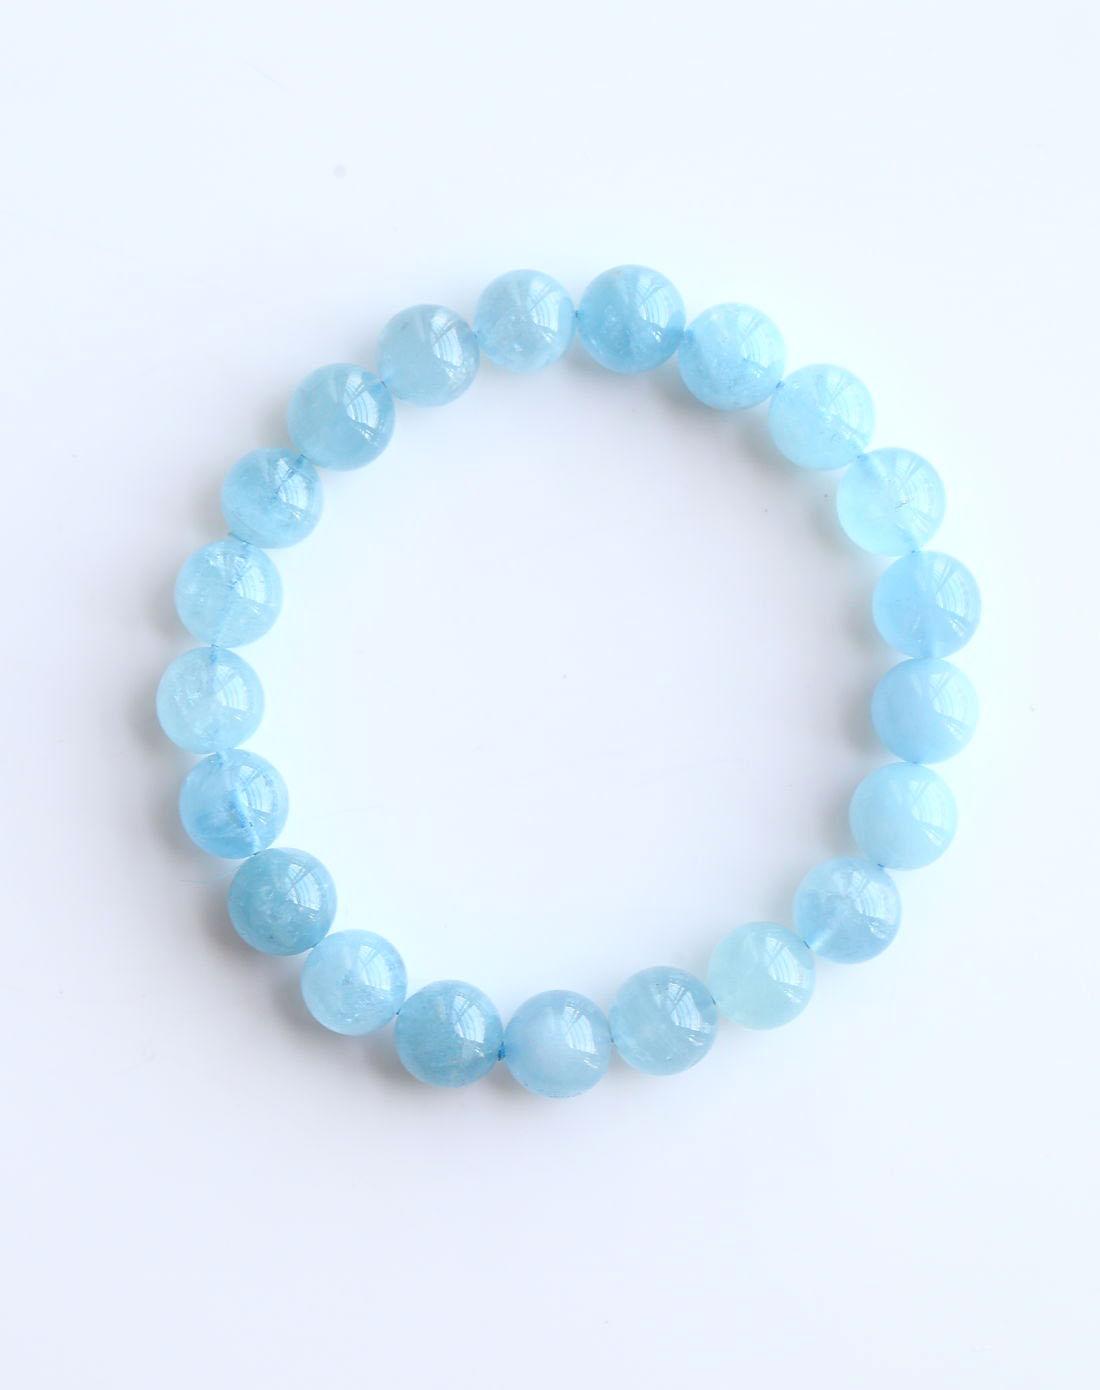 royal gem / 天然冰种9mm海蓝宝手串(权威证书)